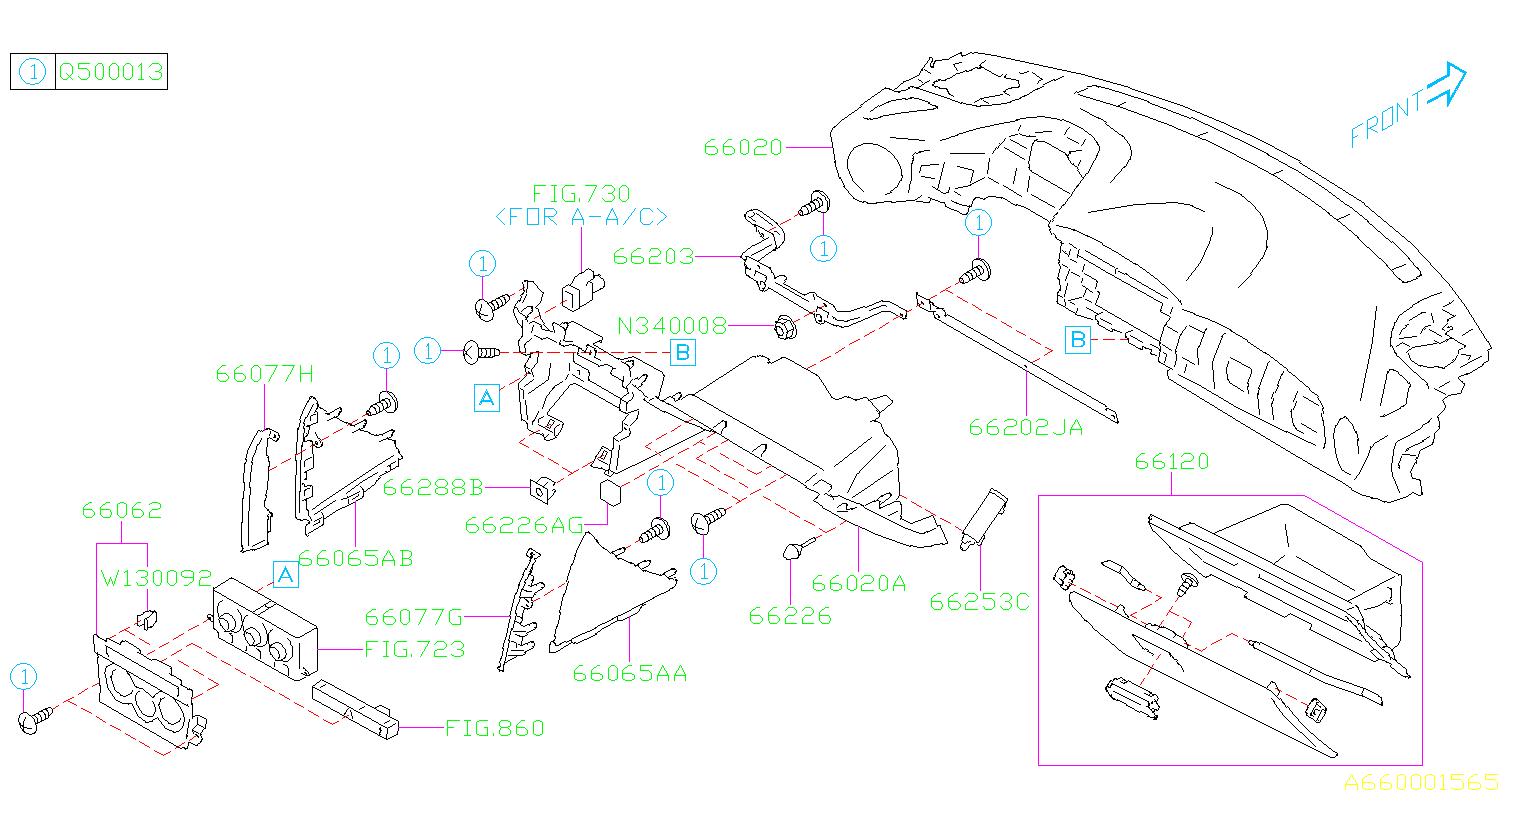 Z10_66001565 subaru brz sun visor wiring diagrams wiring diagrams  at crackthecode.co